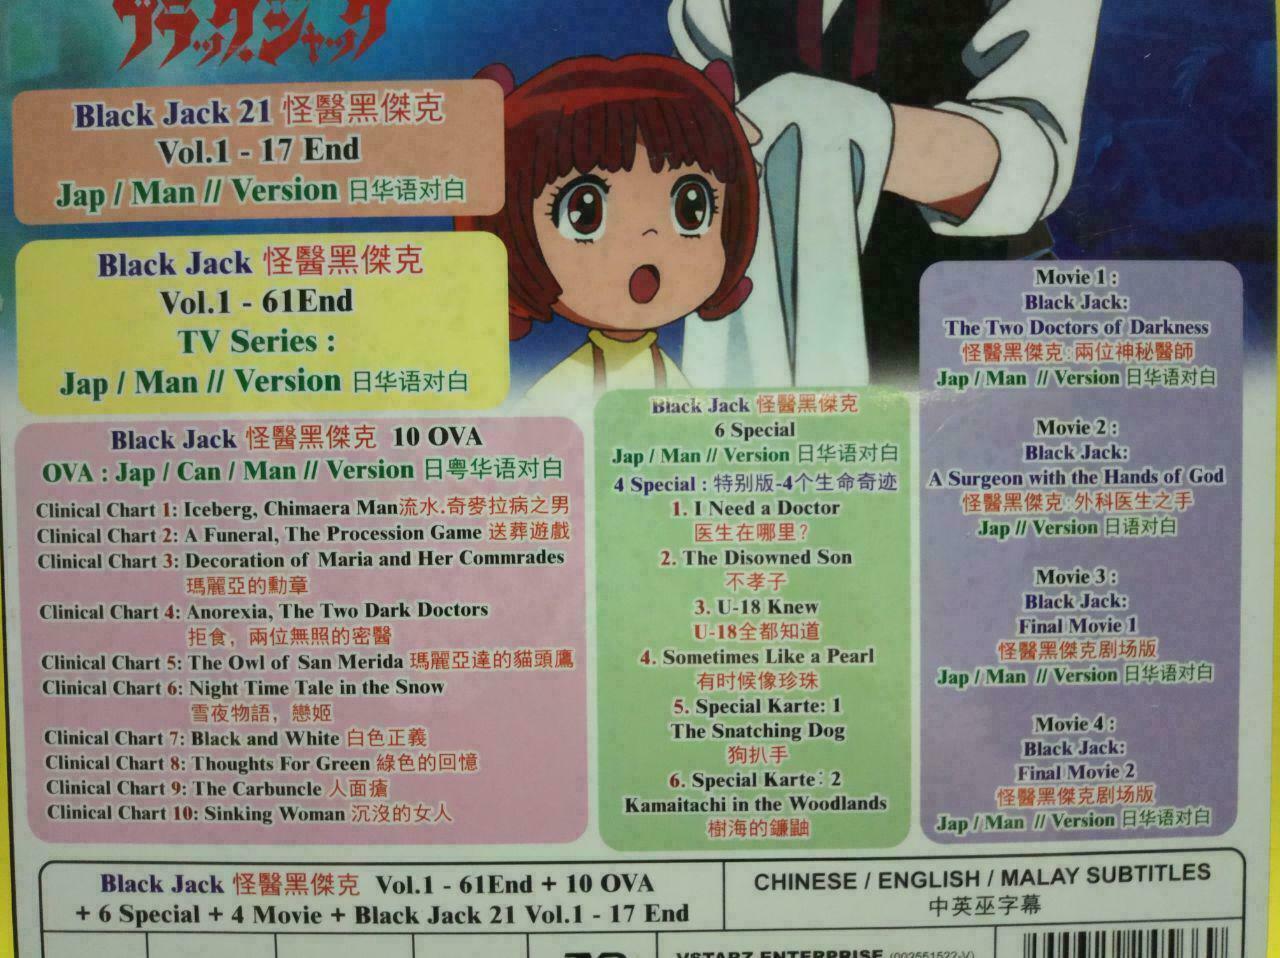 BLACK JACK VOL.1-61 END + 4 MOVIE + 10 OVA + 6 SP ENGLISH SUB Ship From USA